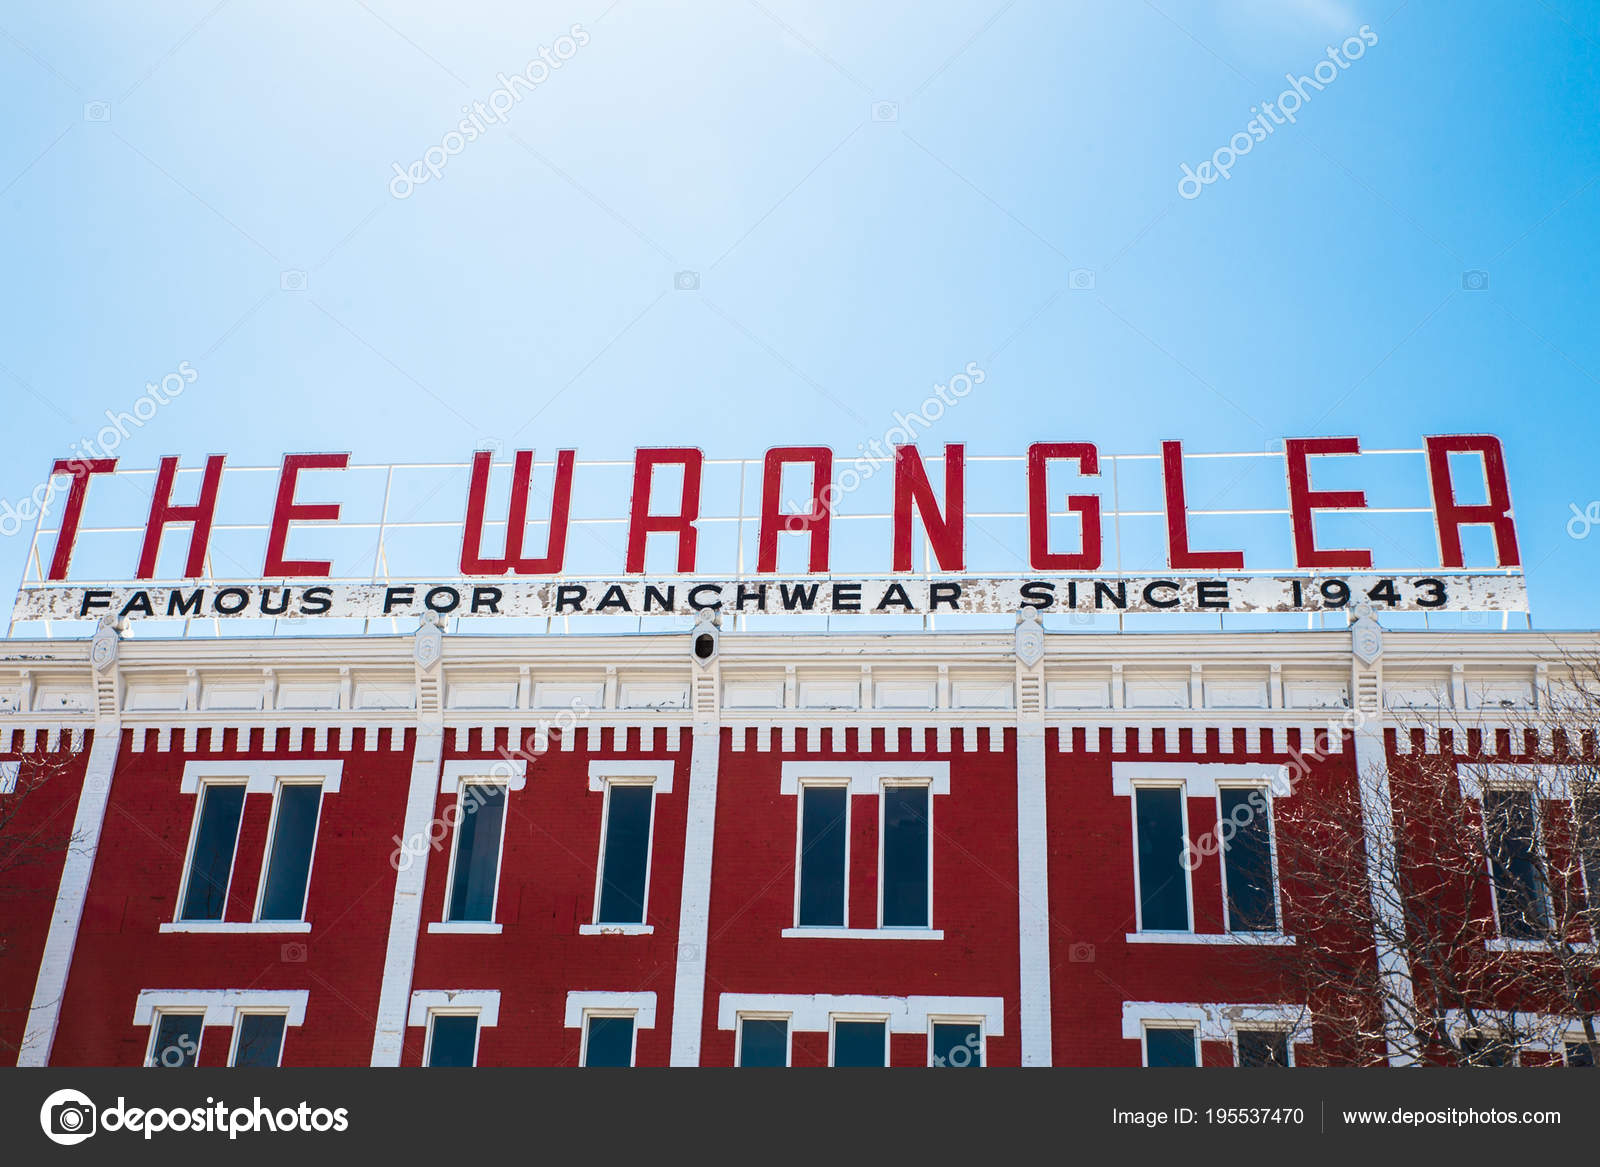 65dbf1d45249 Cheyenne Wyoming Dubna 2018 Pohled Wrangler Historickém Centru Města  Cheyenne — Stock fotografie